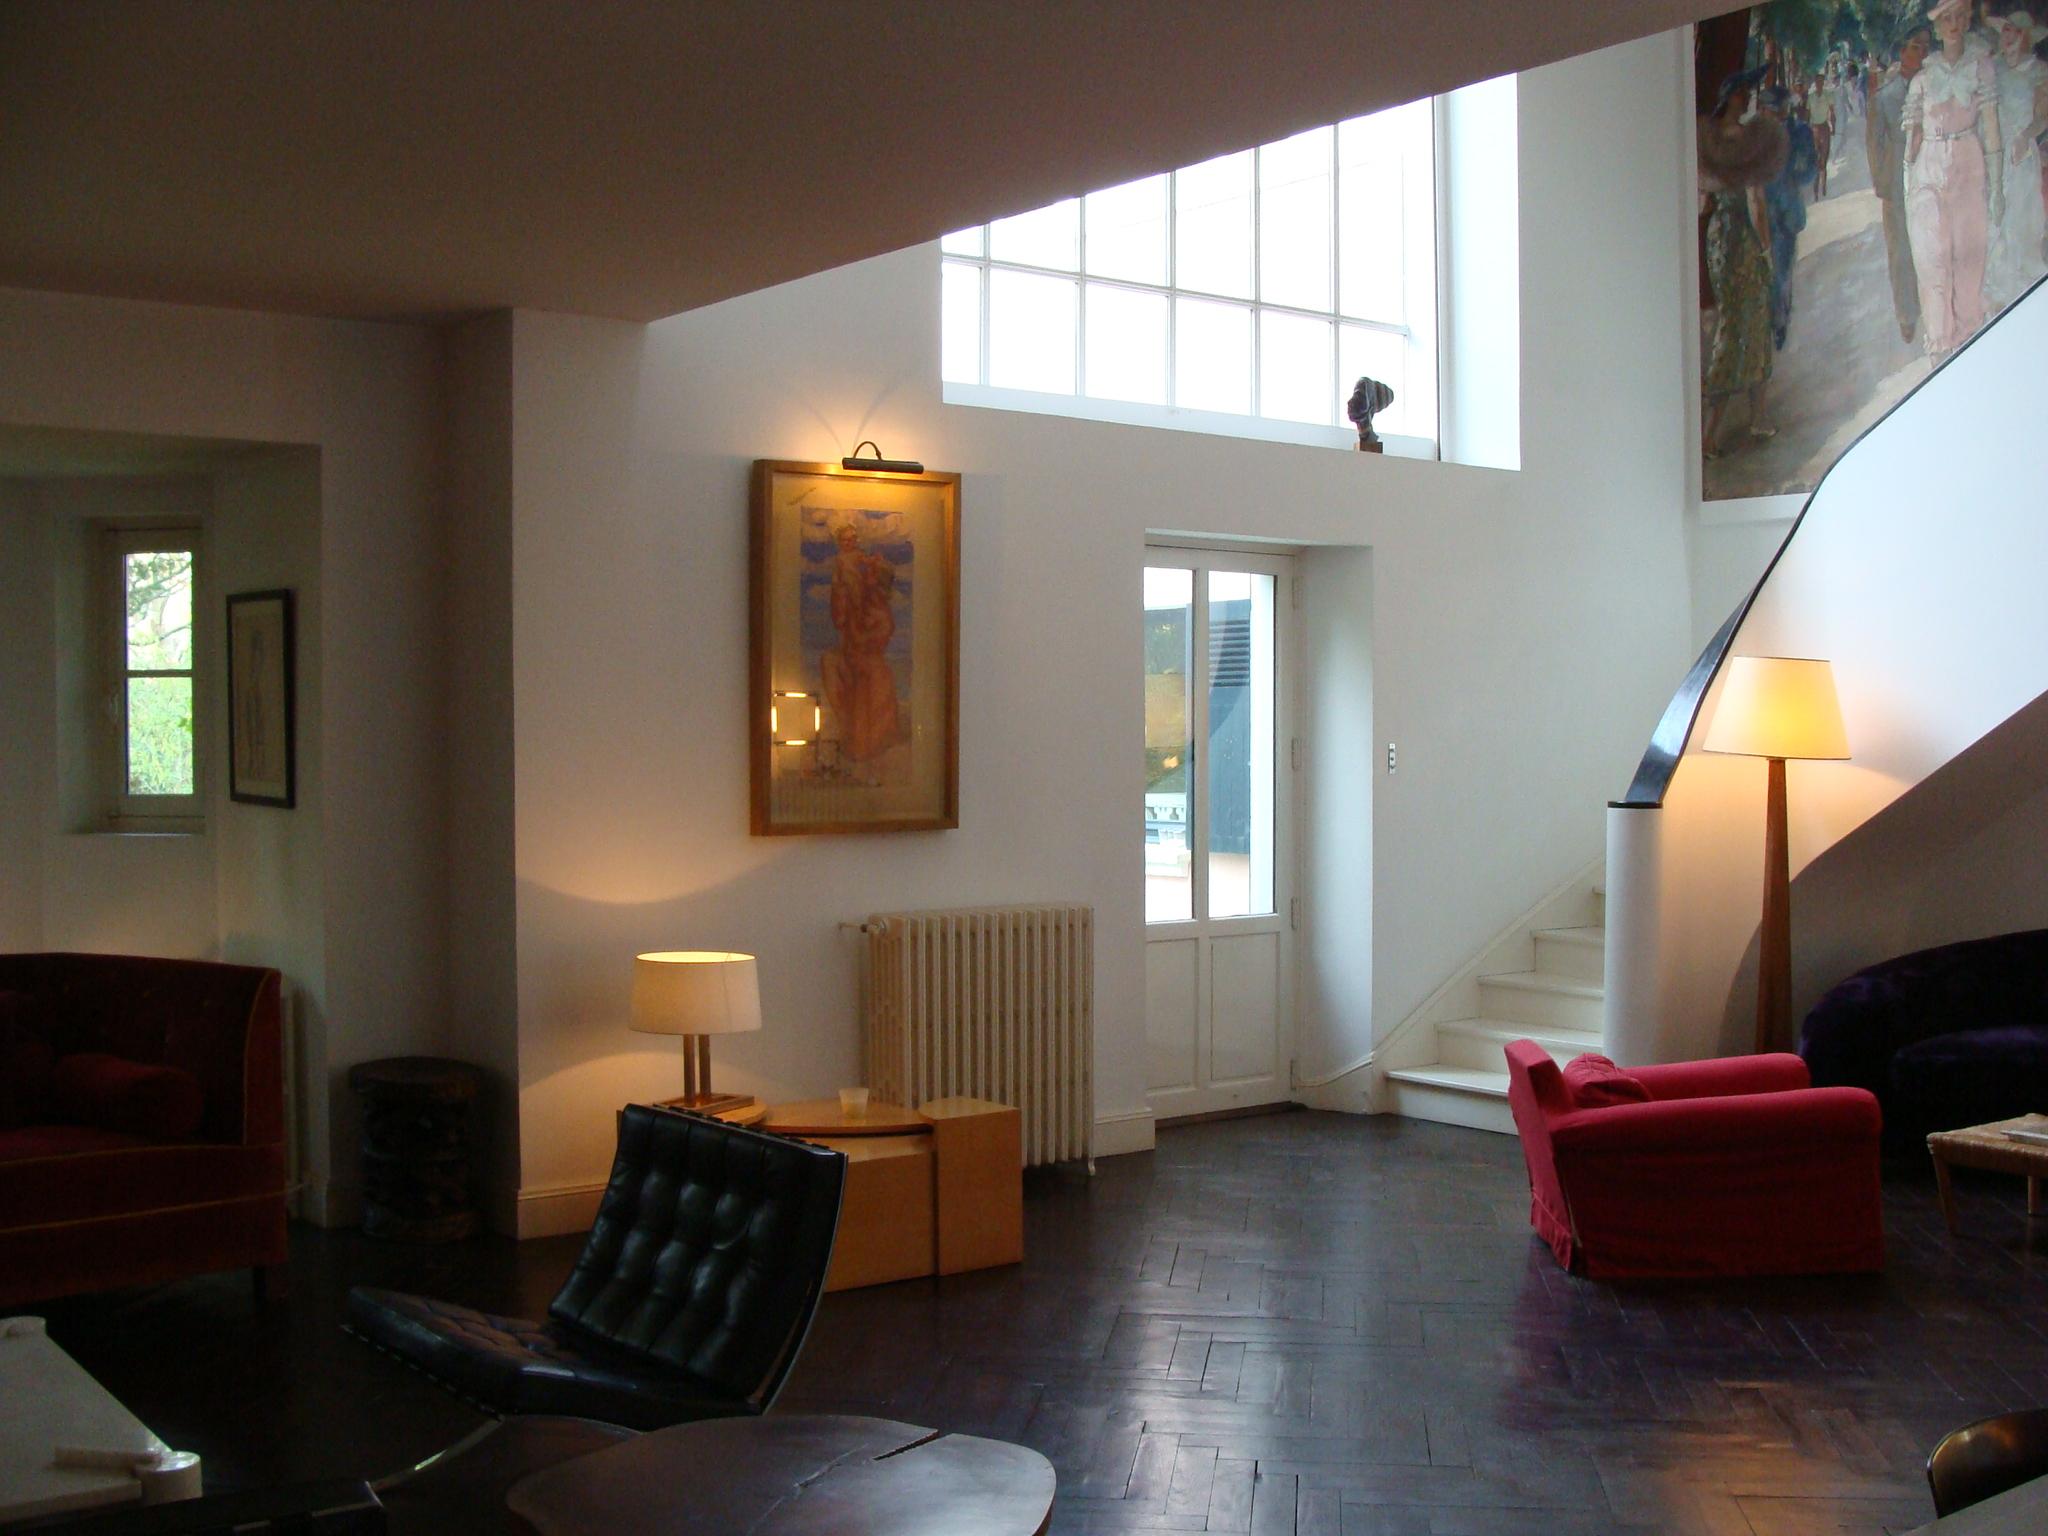 vendu biarritz maison art d co. Black Bedroom Furniture Sets. Home Design Ideas